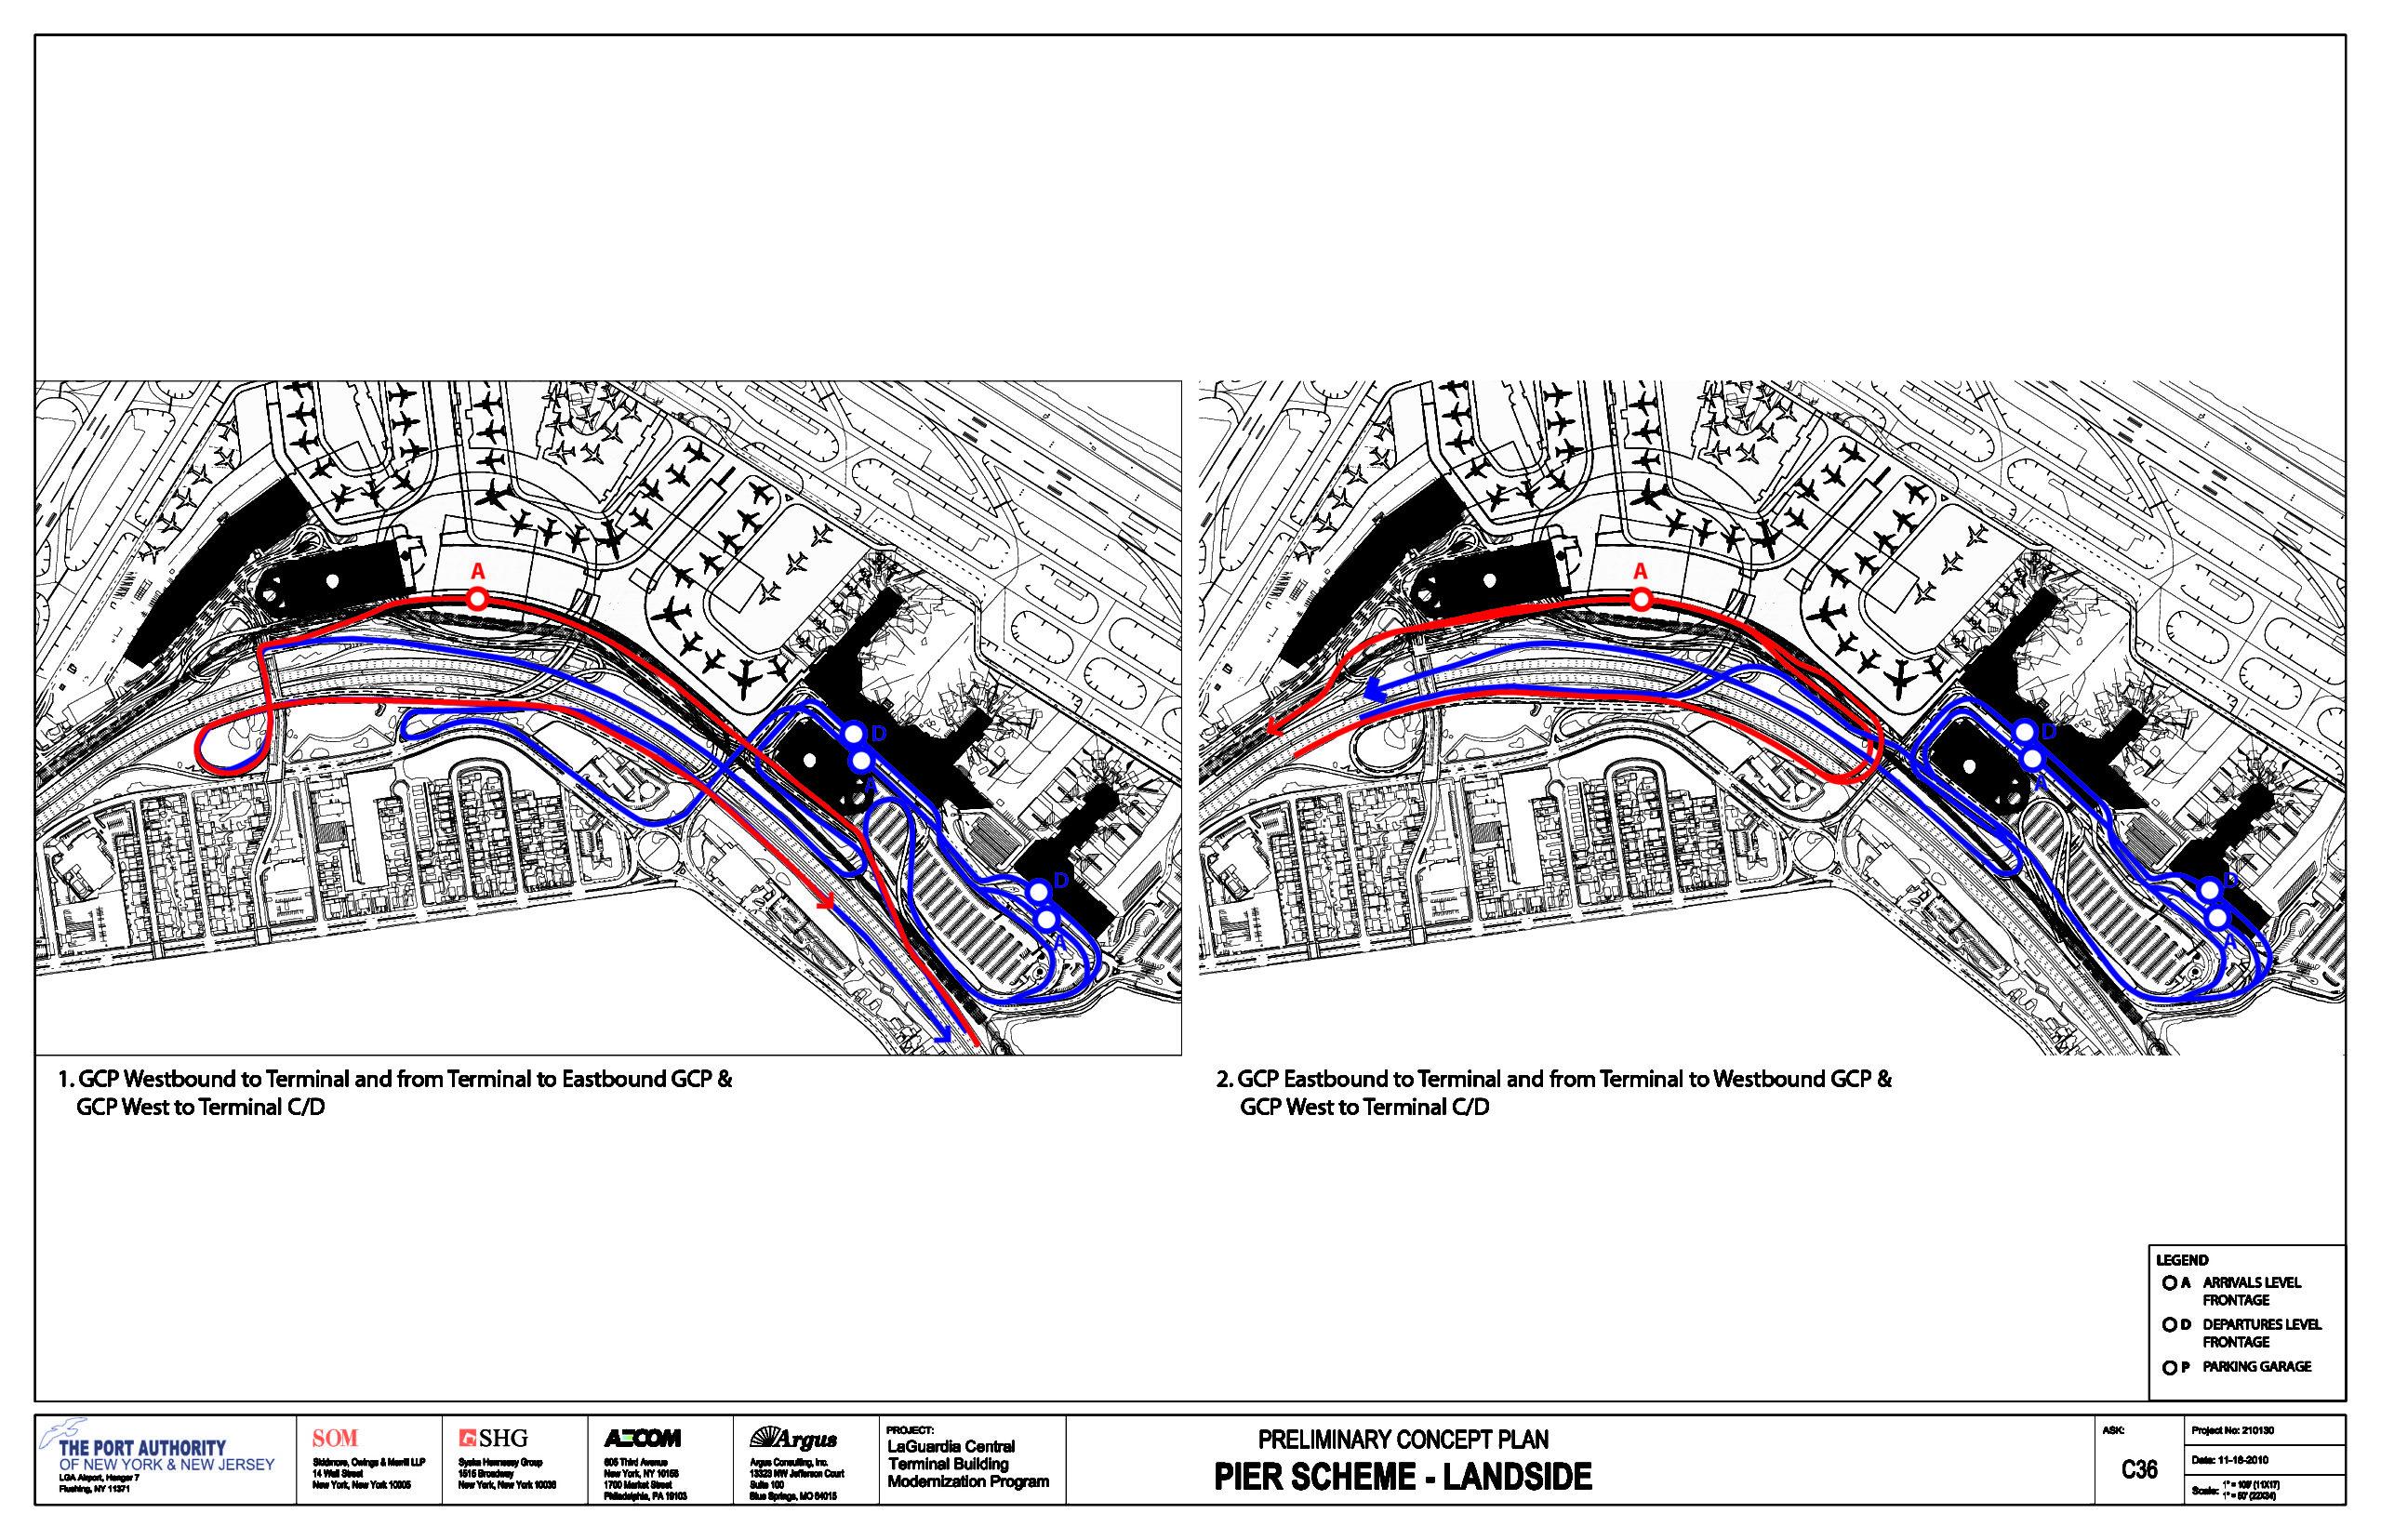 C36 roadway diagrams combined